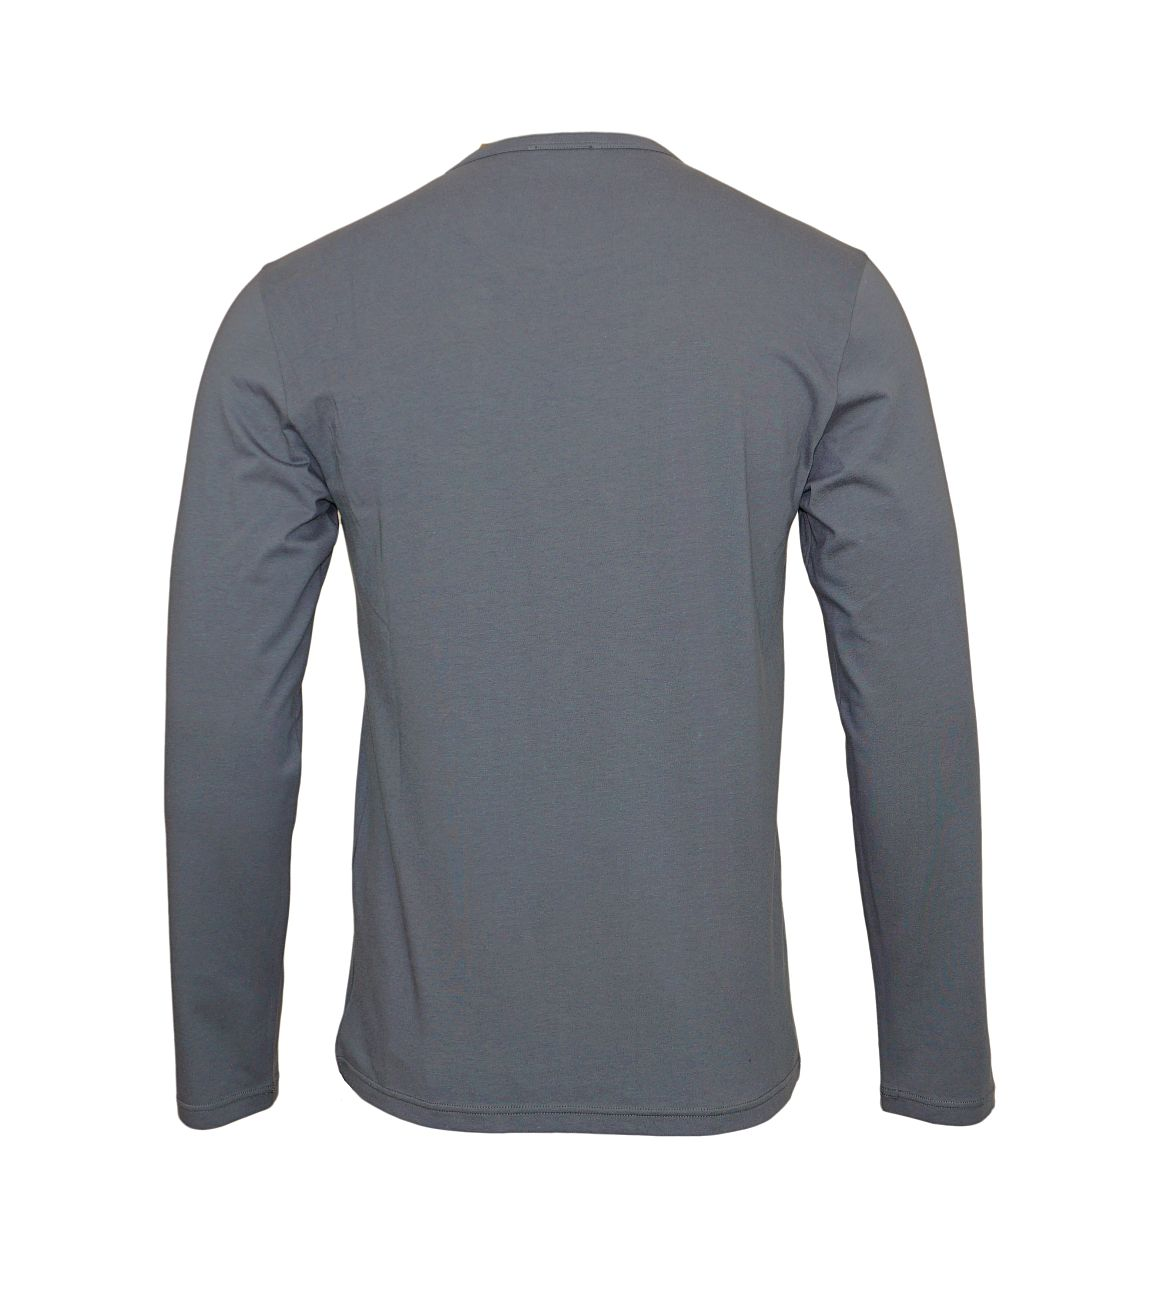 Emporio Armani Longsleeve Shirt Rundhals 111653 8A715 00044 ANTRACITE SH18-EAL1